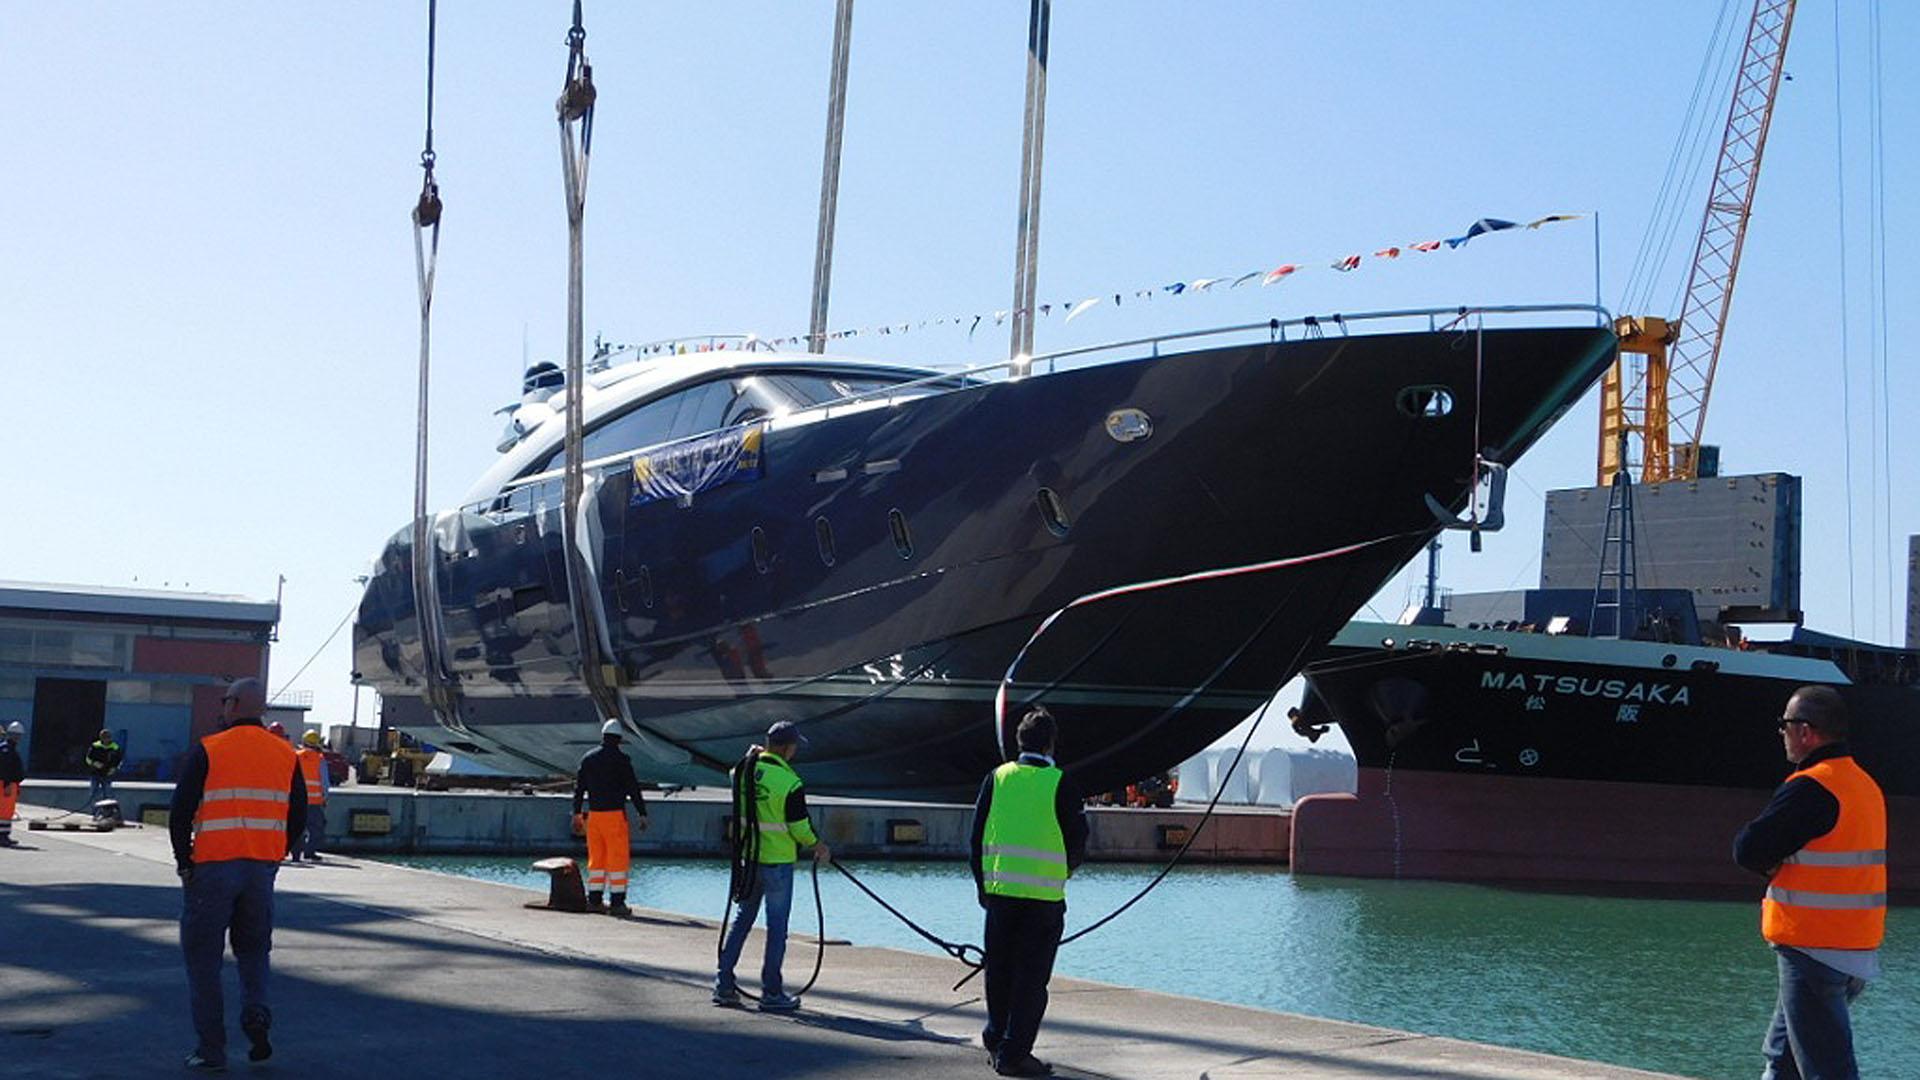 ab-100-motor-yacht-2016-30m-half-profile-launch